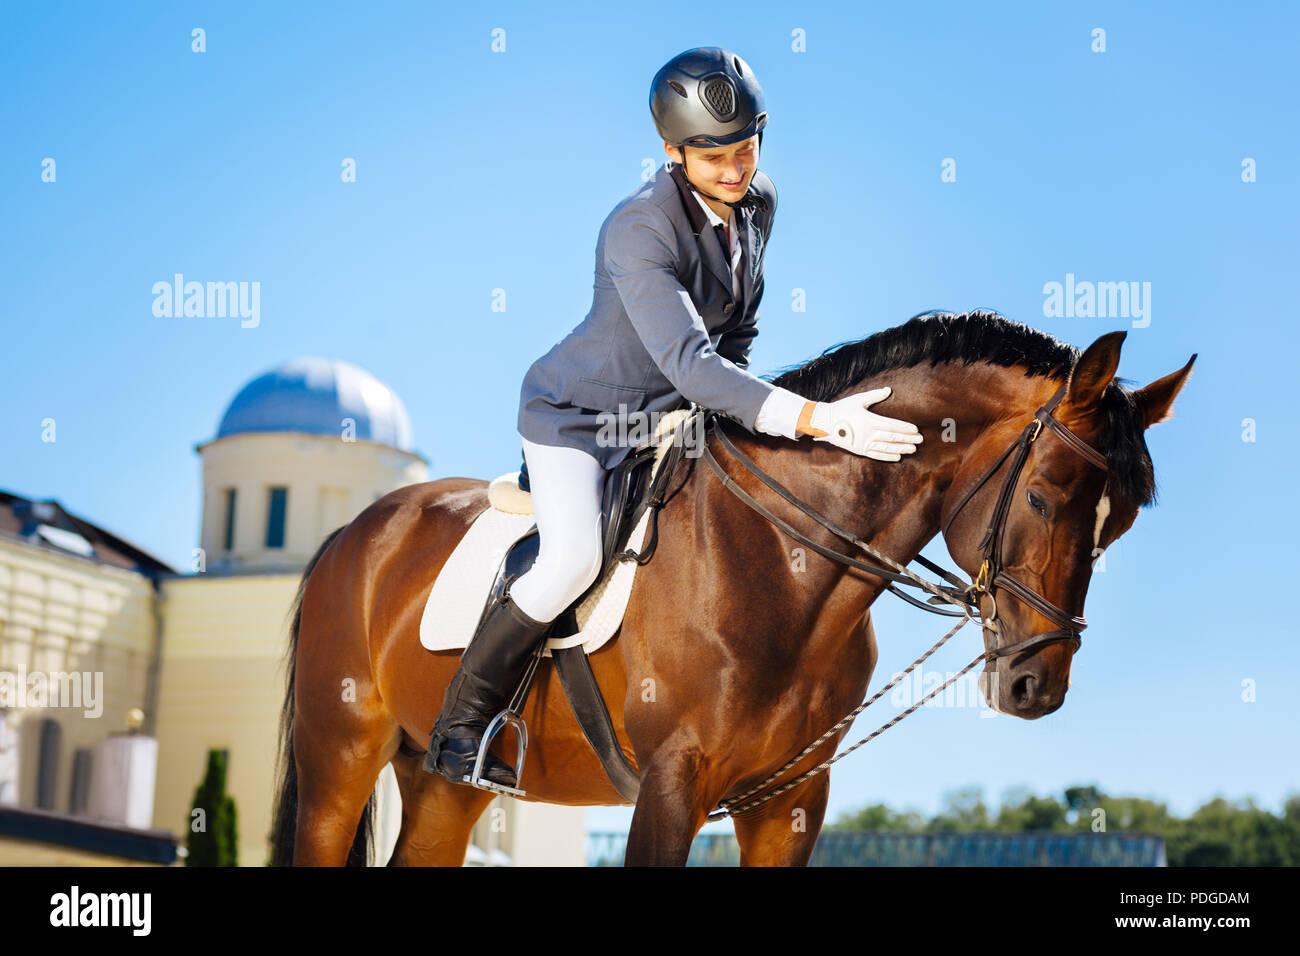 Handsome smiling man wearing helmet petting horse - Stock Image